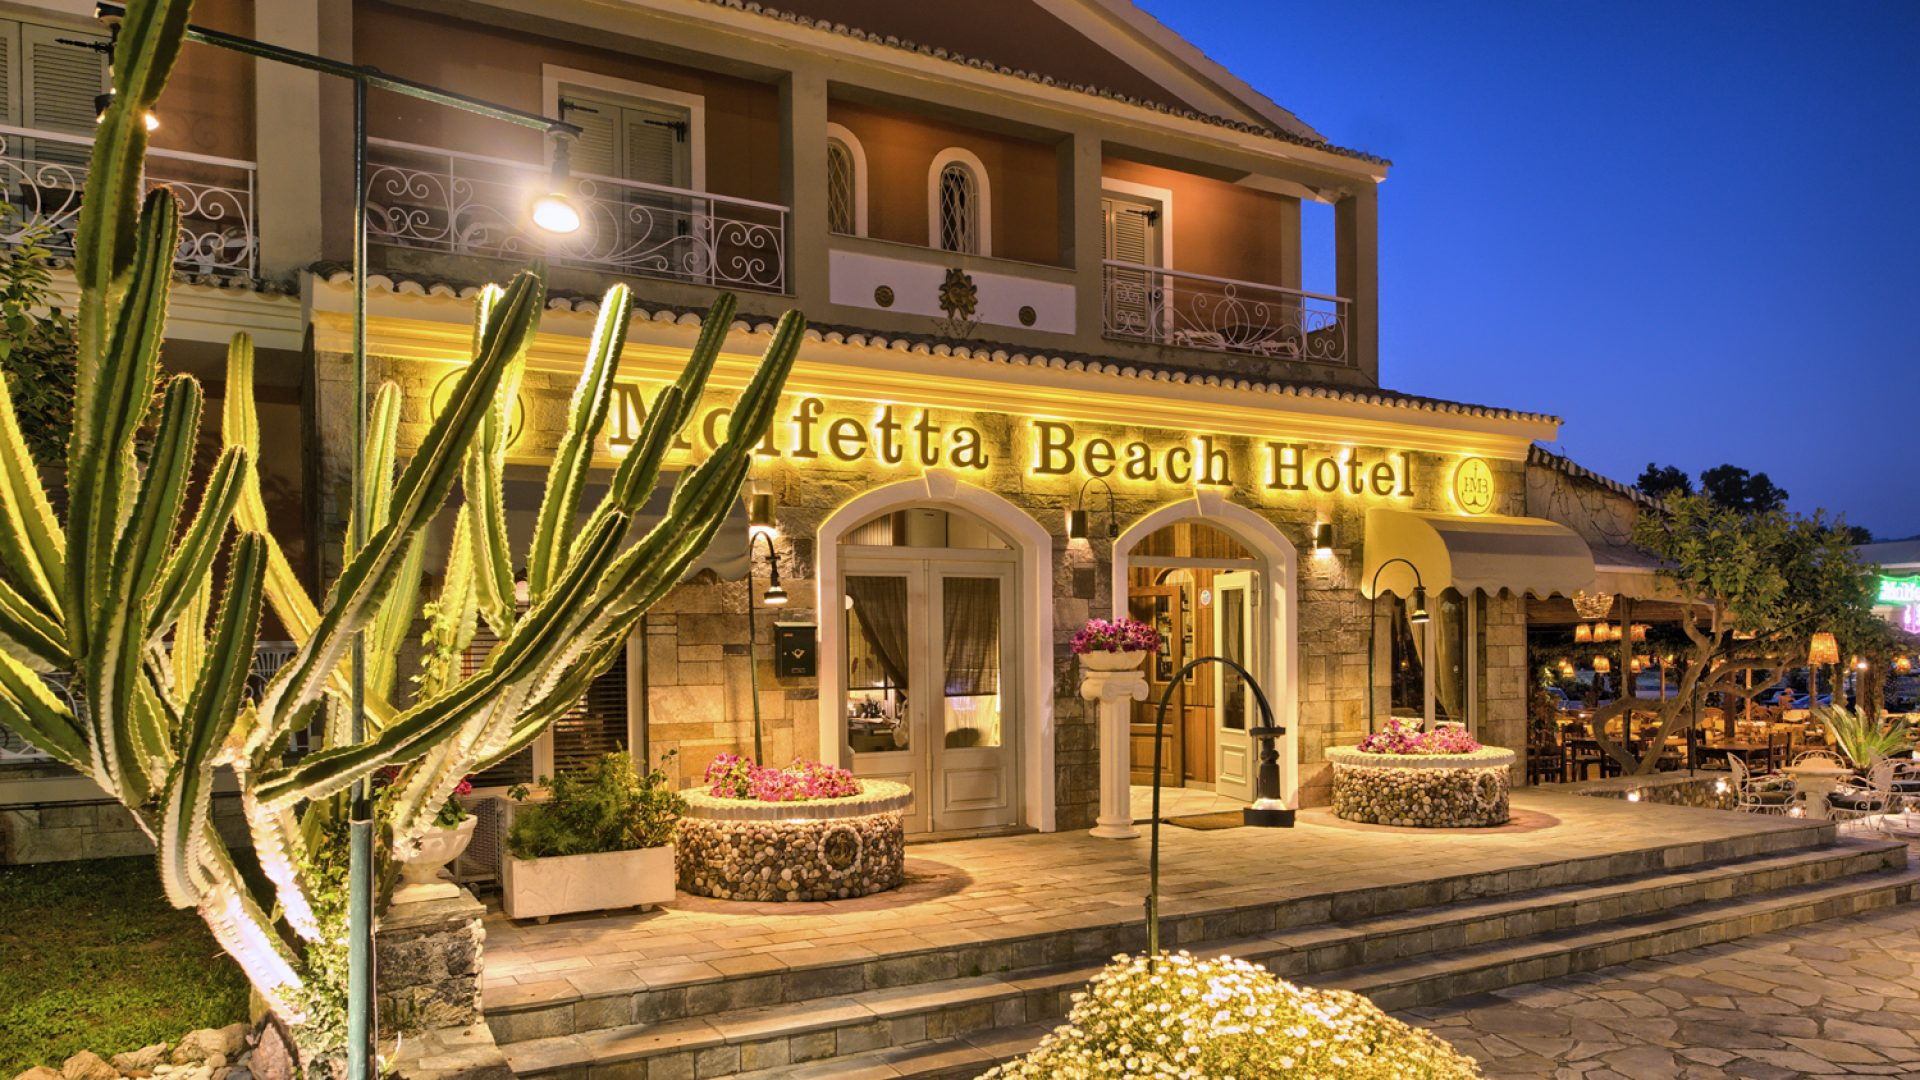 Molfetta Beach Hotel - Κερκυρα ✦ 2 Ημερες (1 Διανυκτερευση) ✦ 2 ατομα ✦ Πρωινο ✦ 01/07/2021 εως 31/08/2021 ✦ Μπροστα στην παραλια!